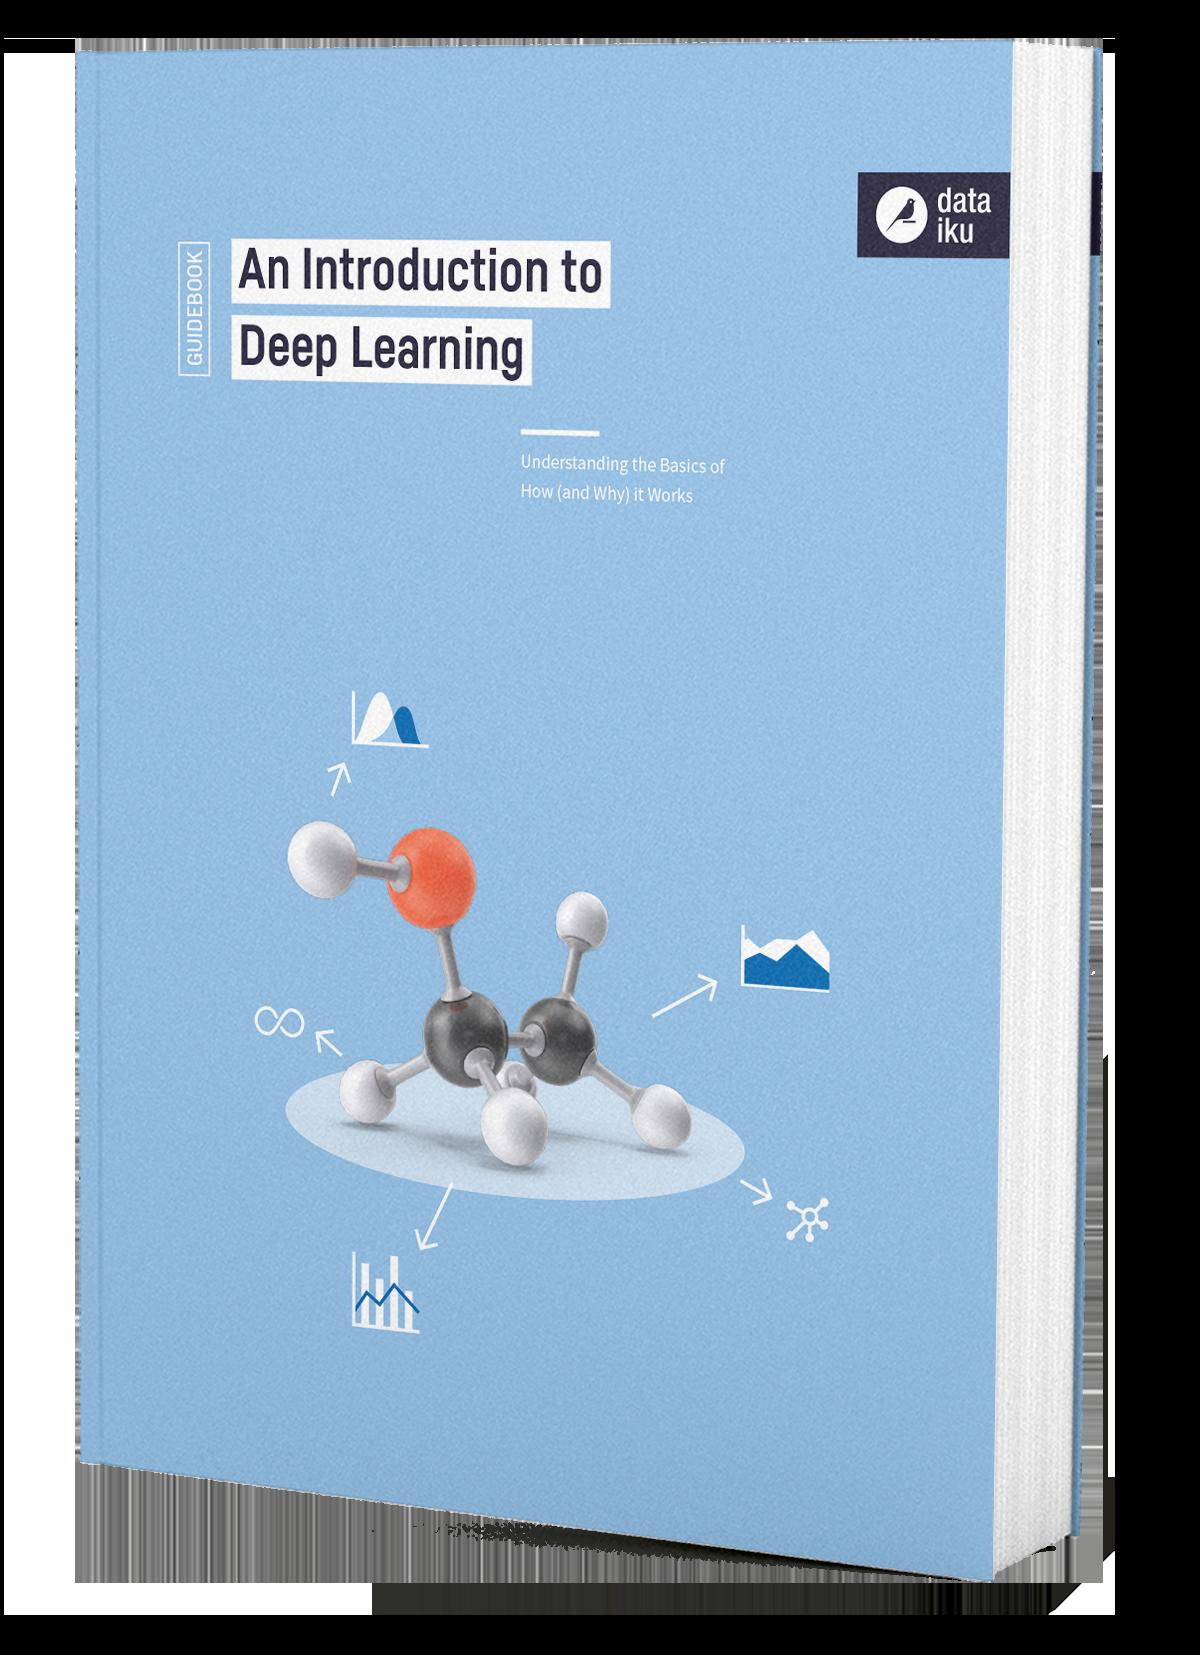 DKU-DATAIKU-EBOOK_COVER-WEB-INTRODUCTION_TO_DEEP_LEARNING-BAT_210518